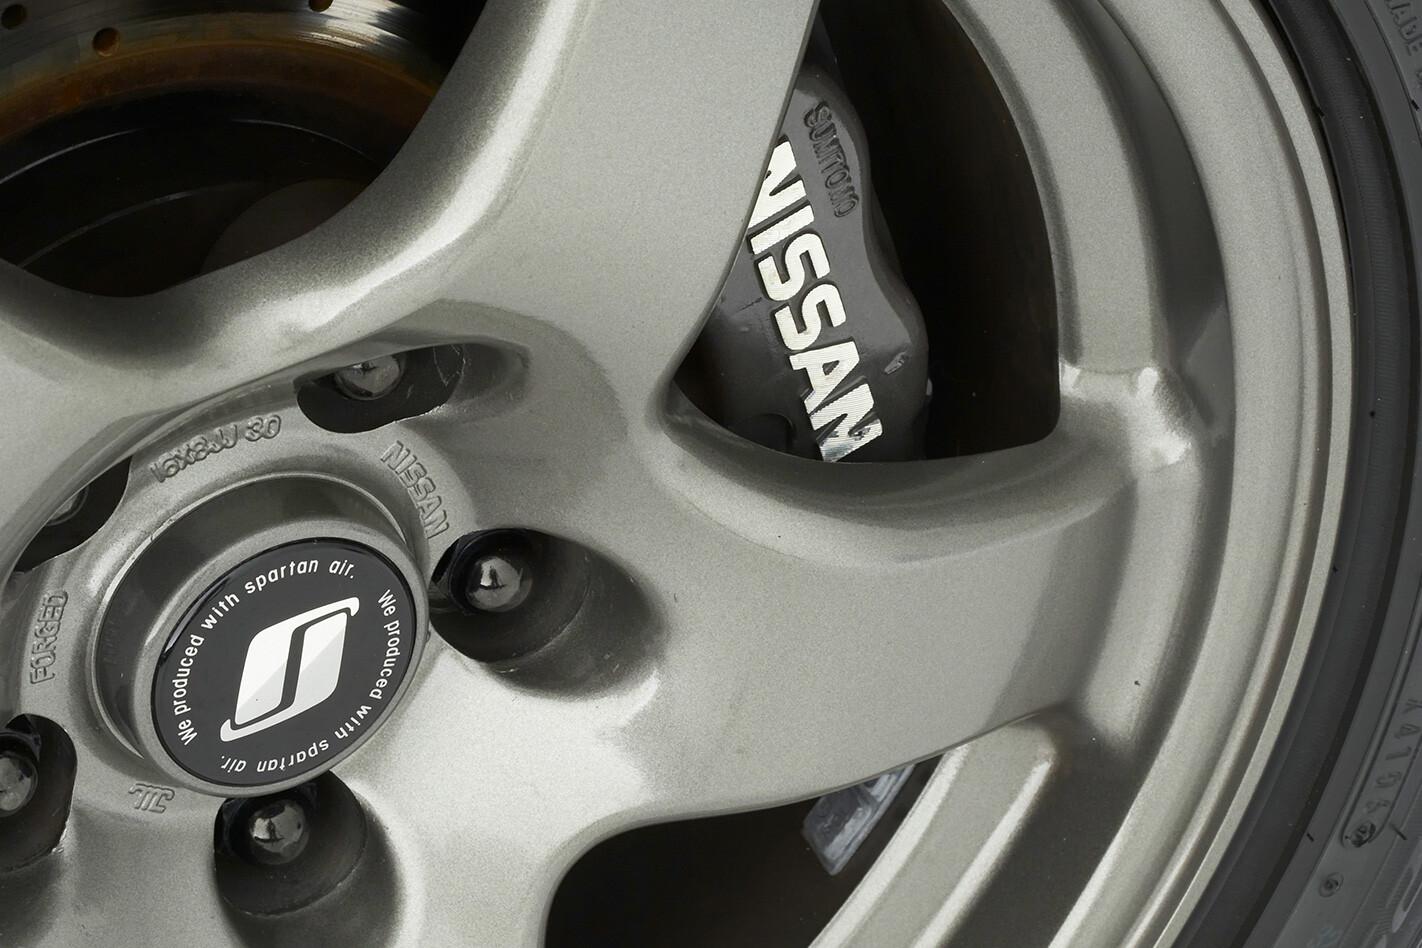 1991-Nissan-Skyline-GT-R-wheel.jpg